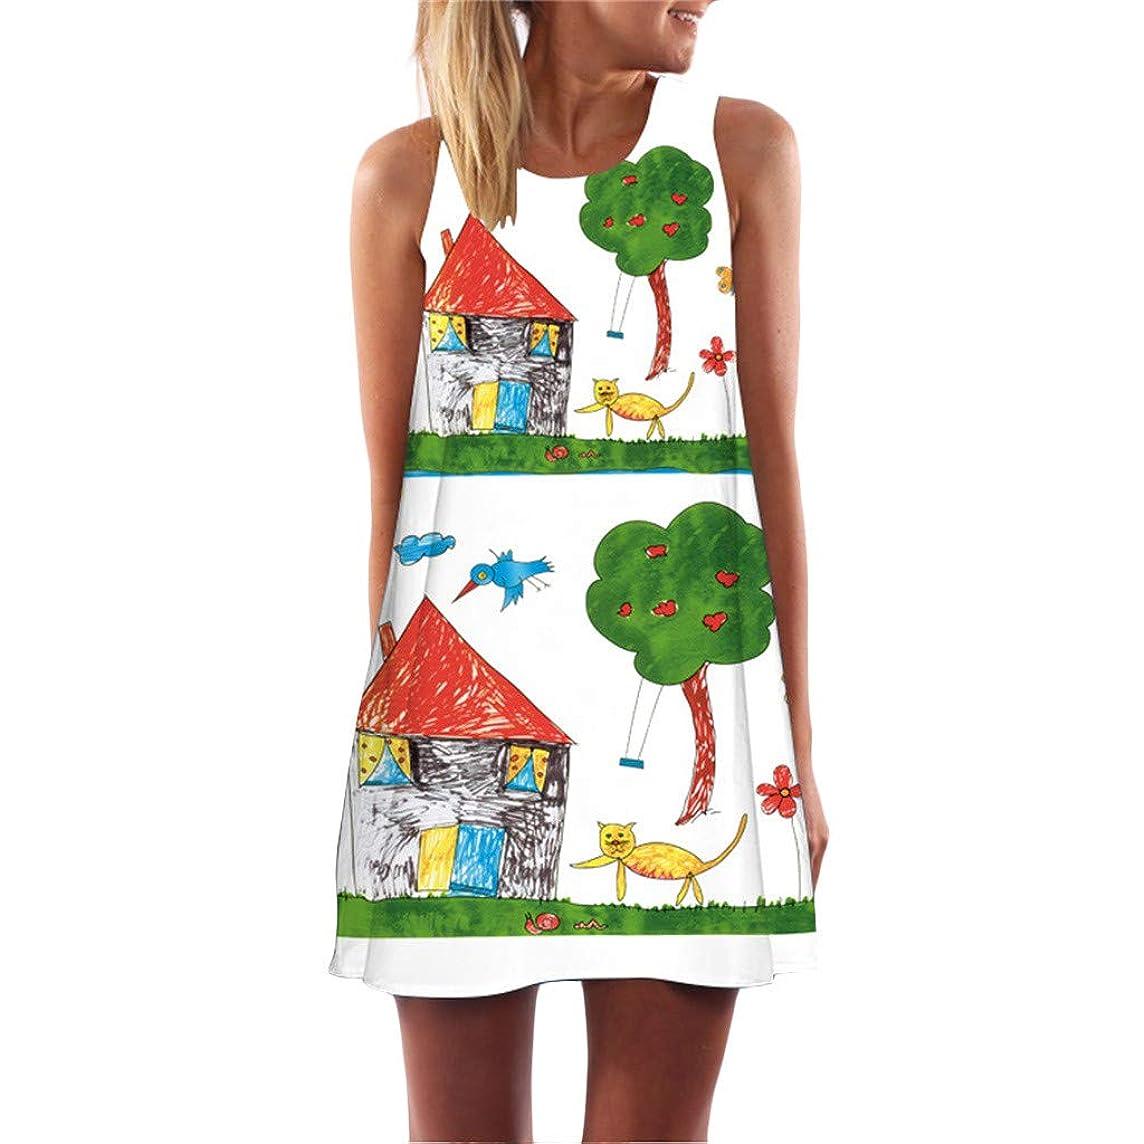 Sagton Fun Summer Dresses for Women Crew Neck Printed Sleeveless Casual Tunic Tops Summer Swing Tee Shirt Dress